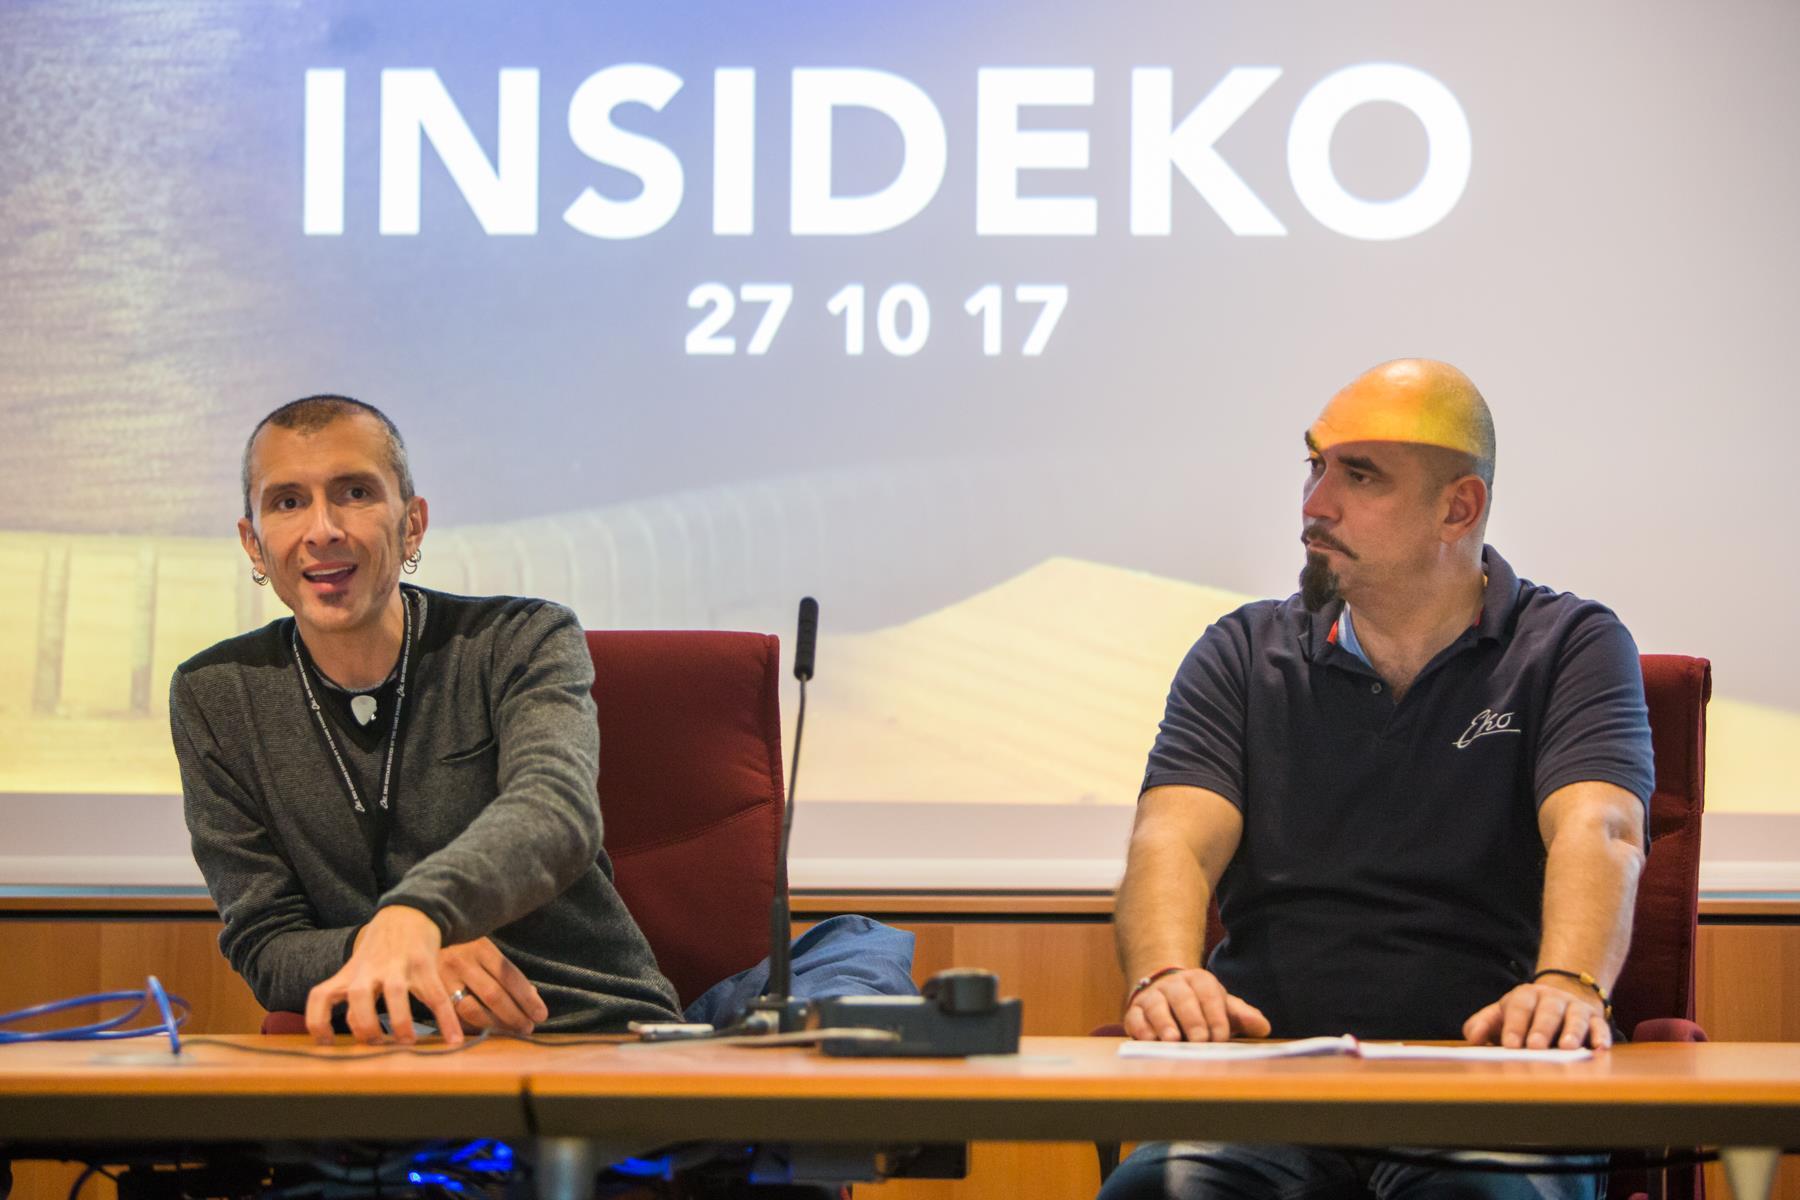 InsidEko 2017